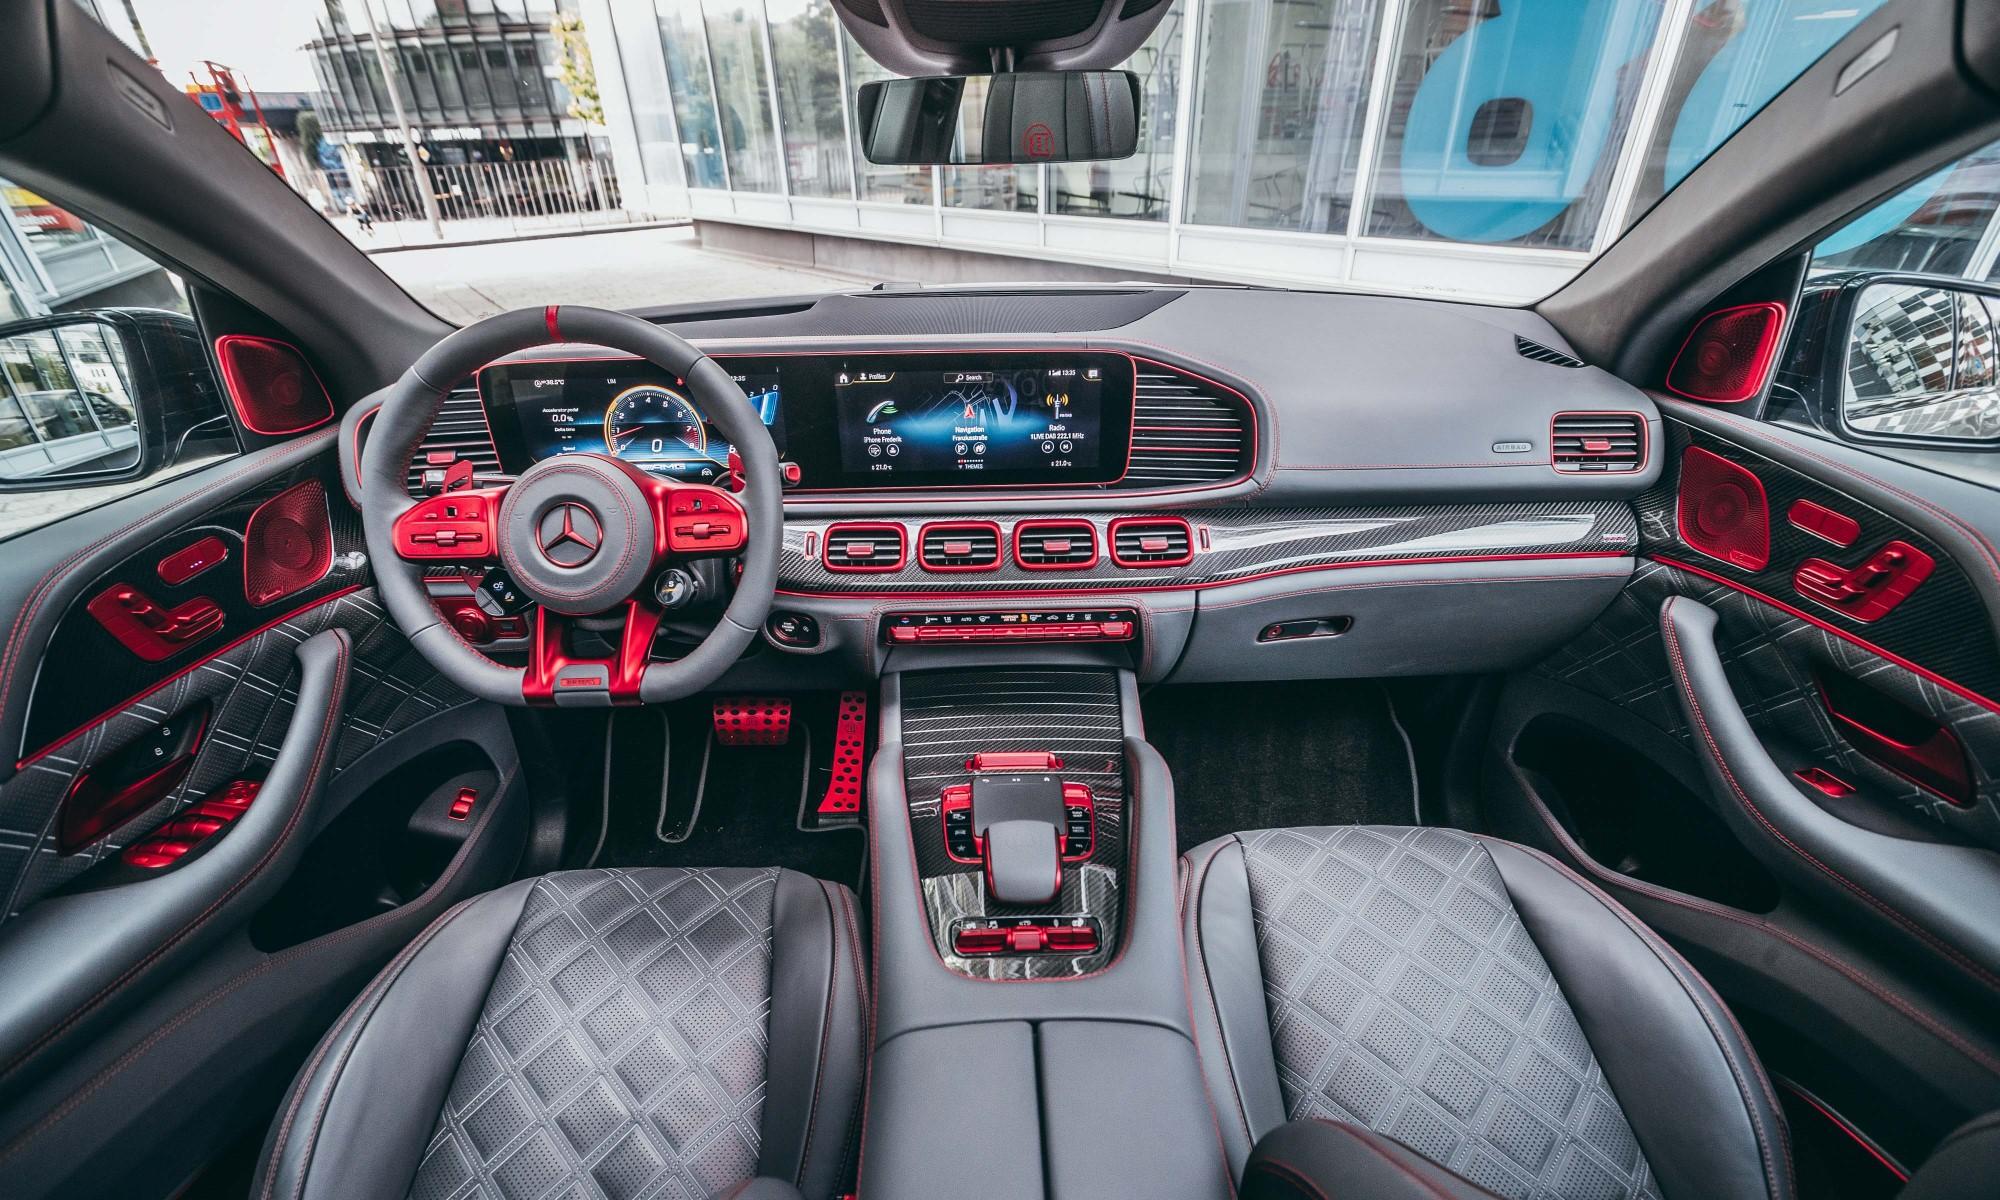 Brabus 900 Rocket Edition GLE interior